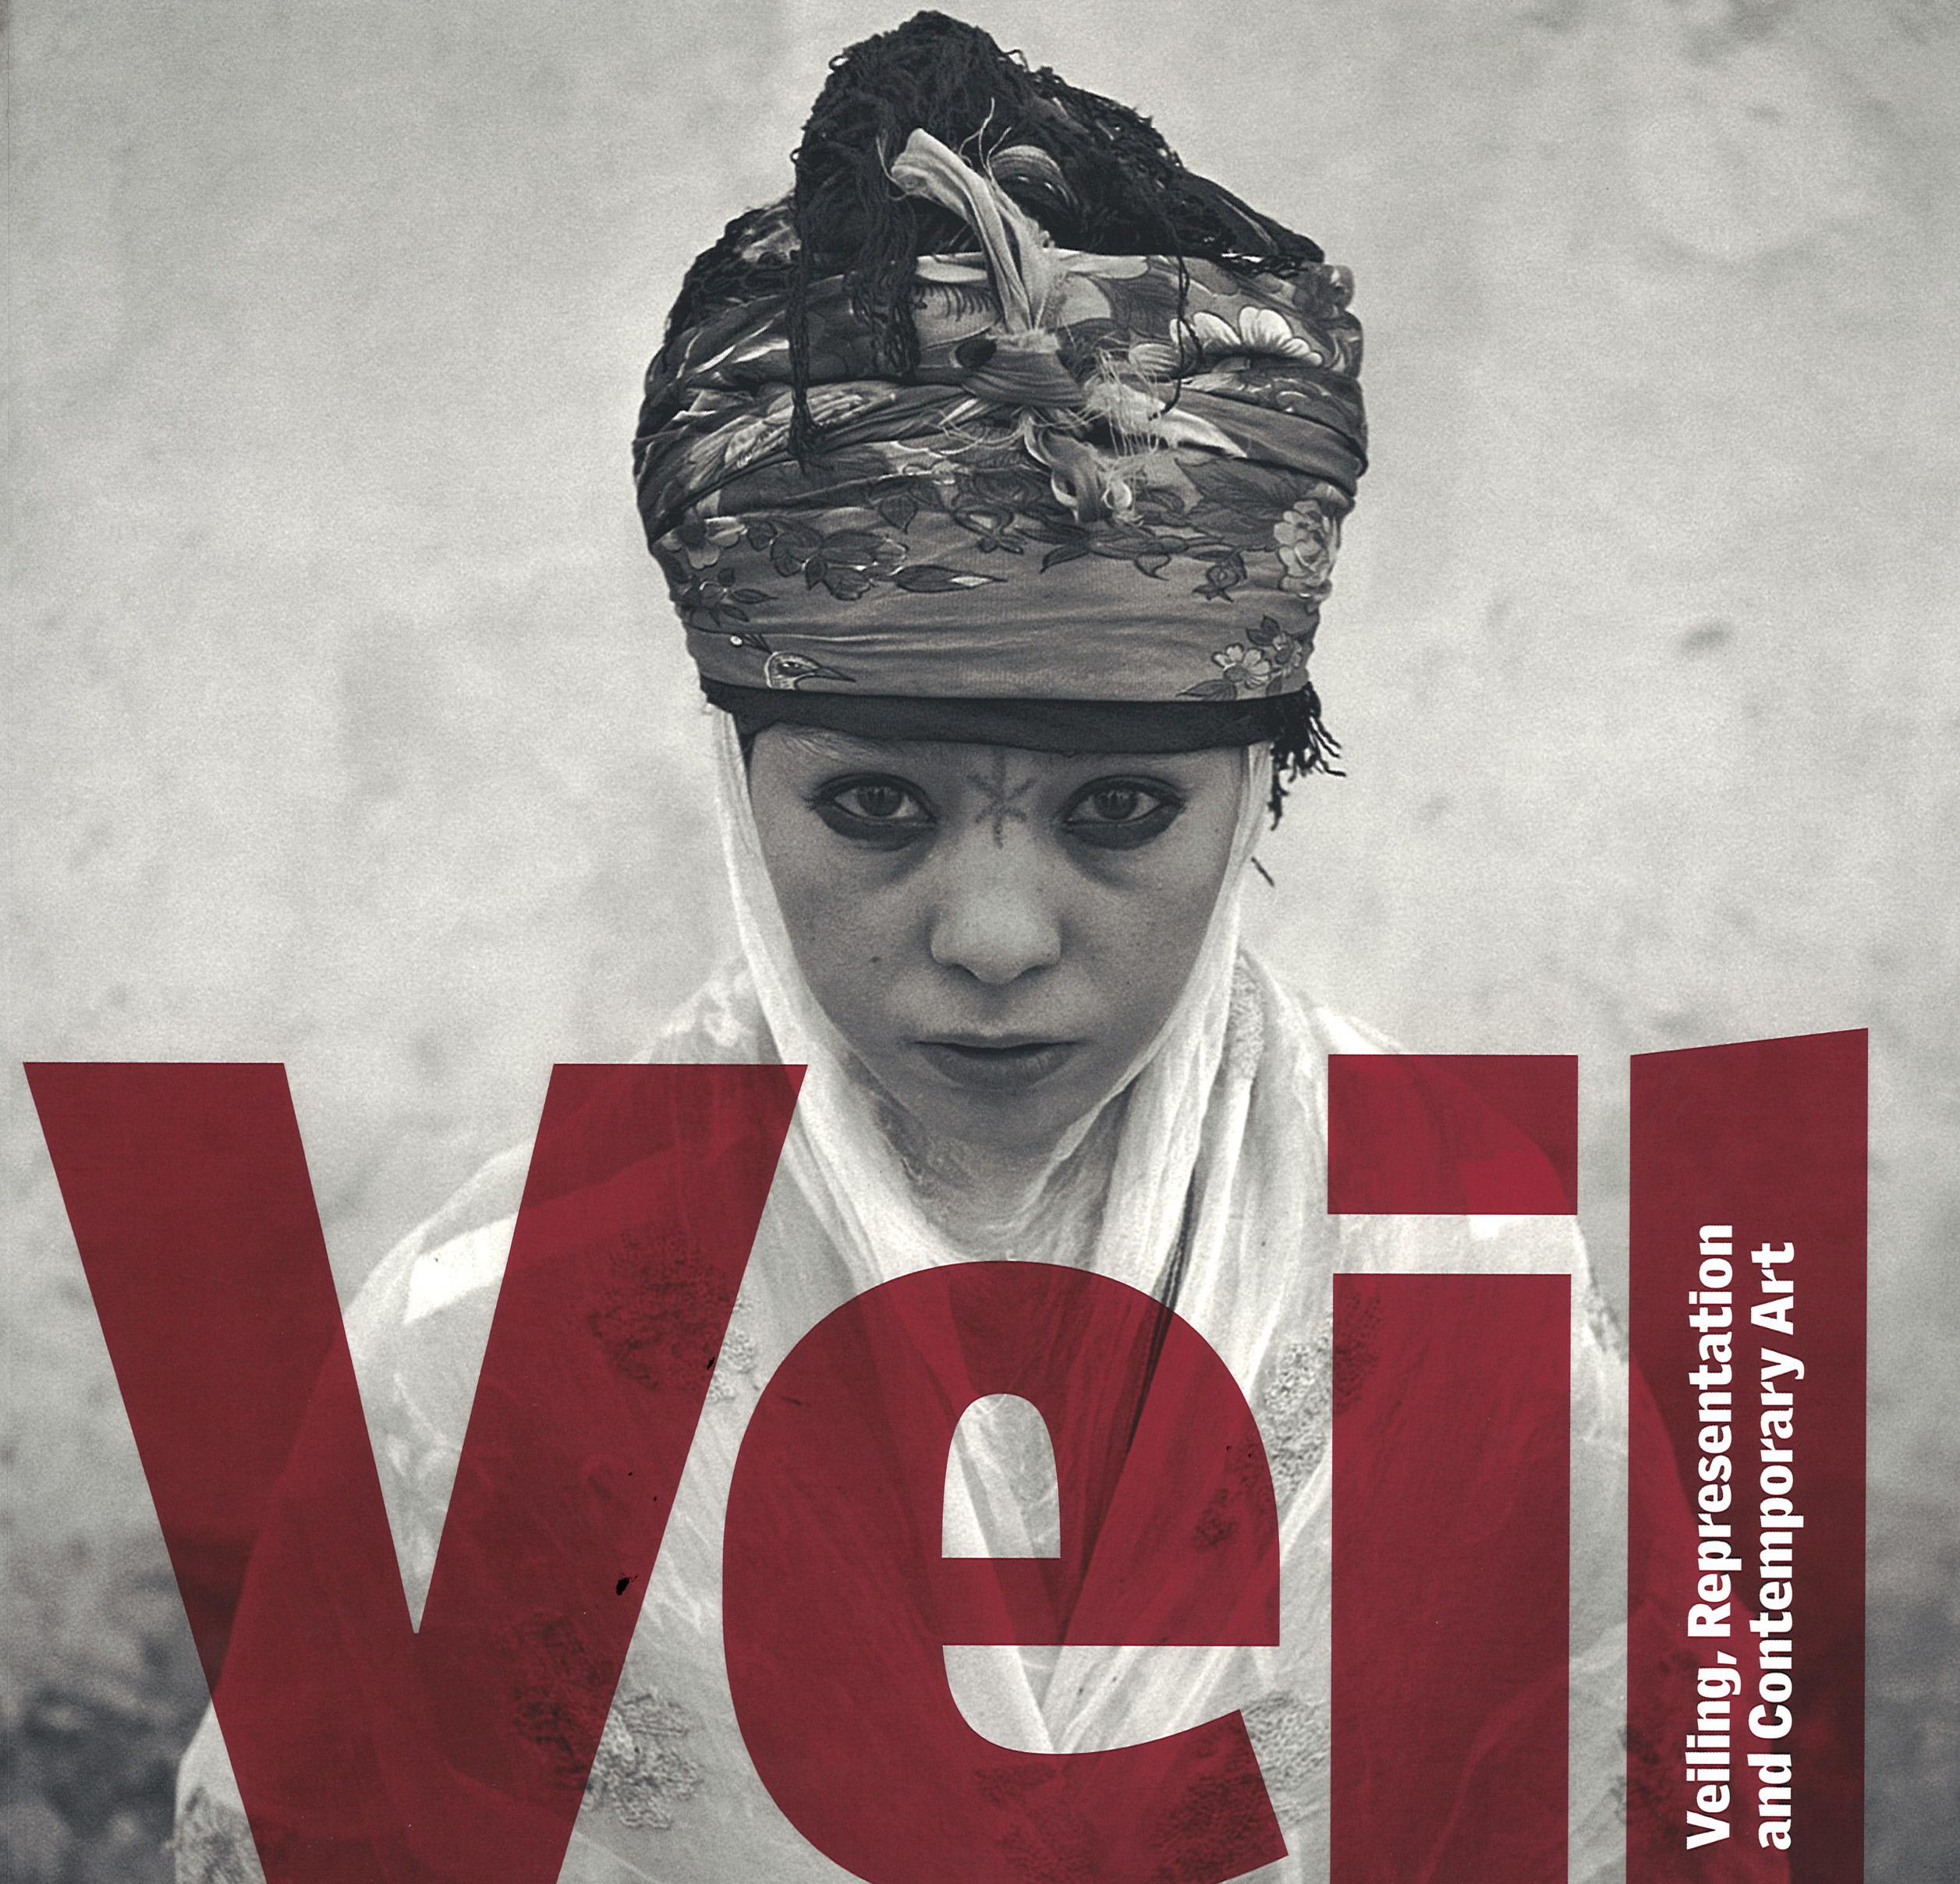 Veil Veiling Representation And Contemporary Art Iniva